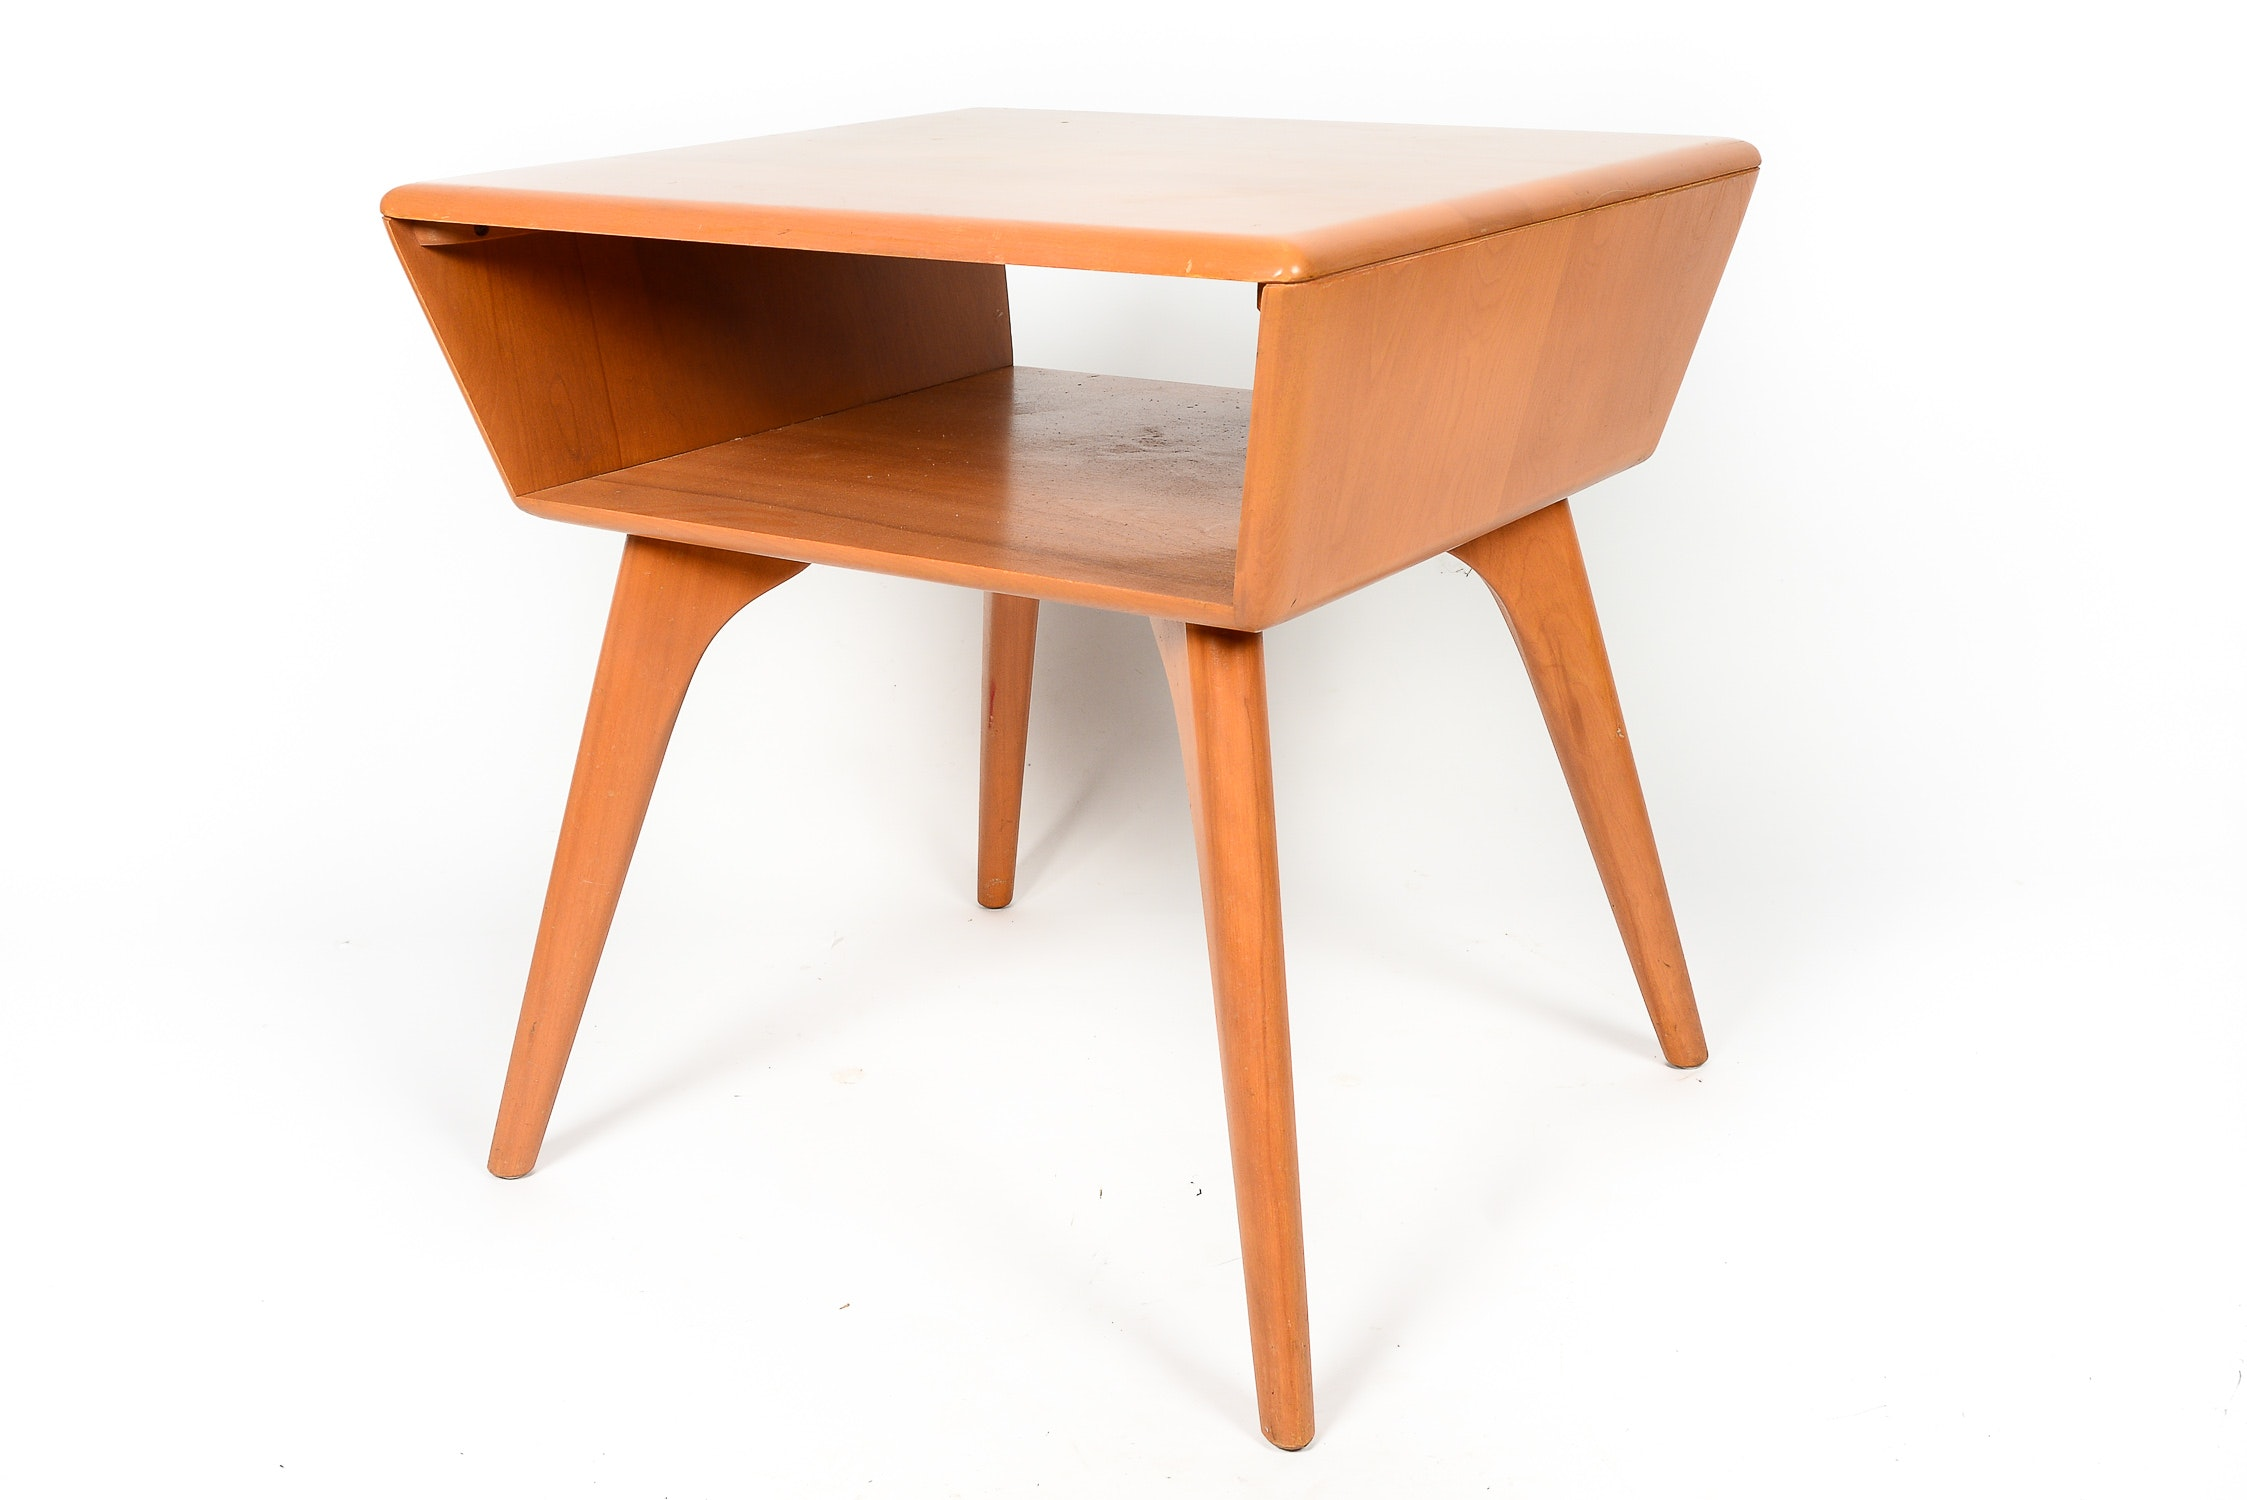 Modern Furniture Nashville nashville, tn mid century modern furniture, home decor & vintage